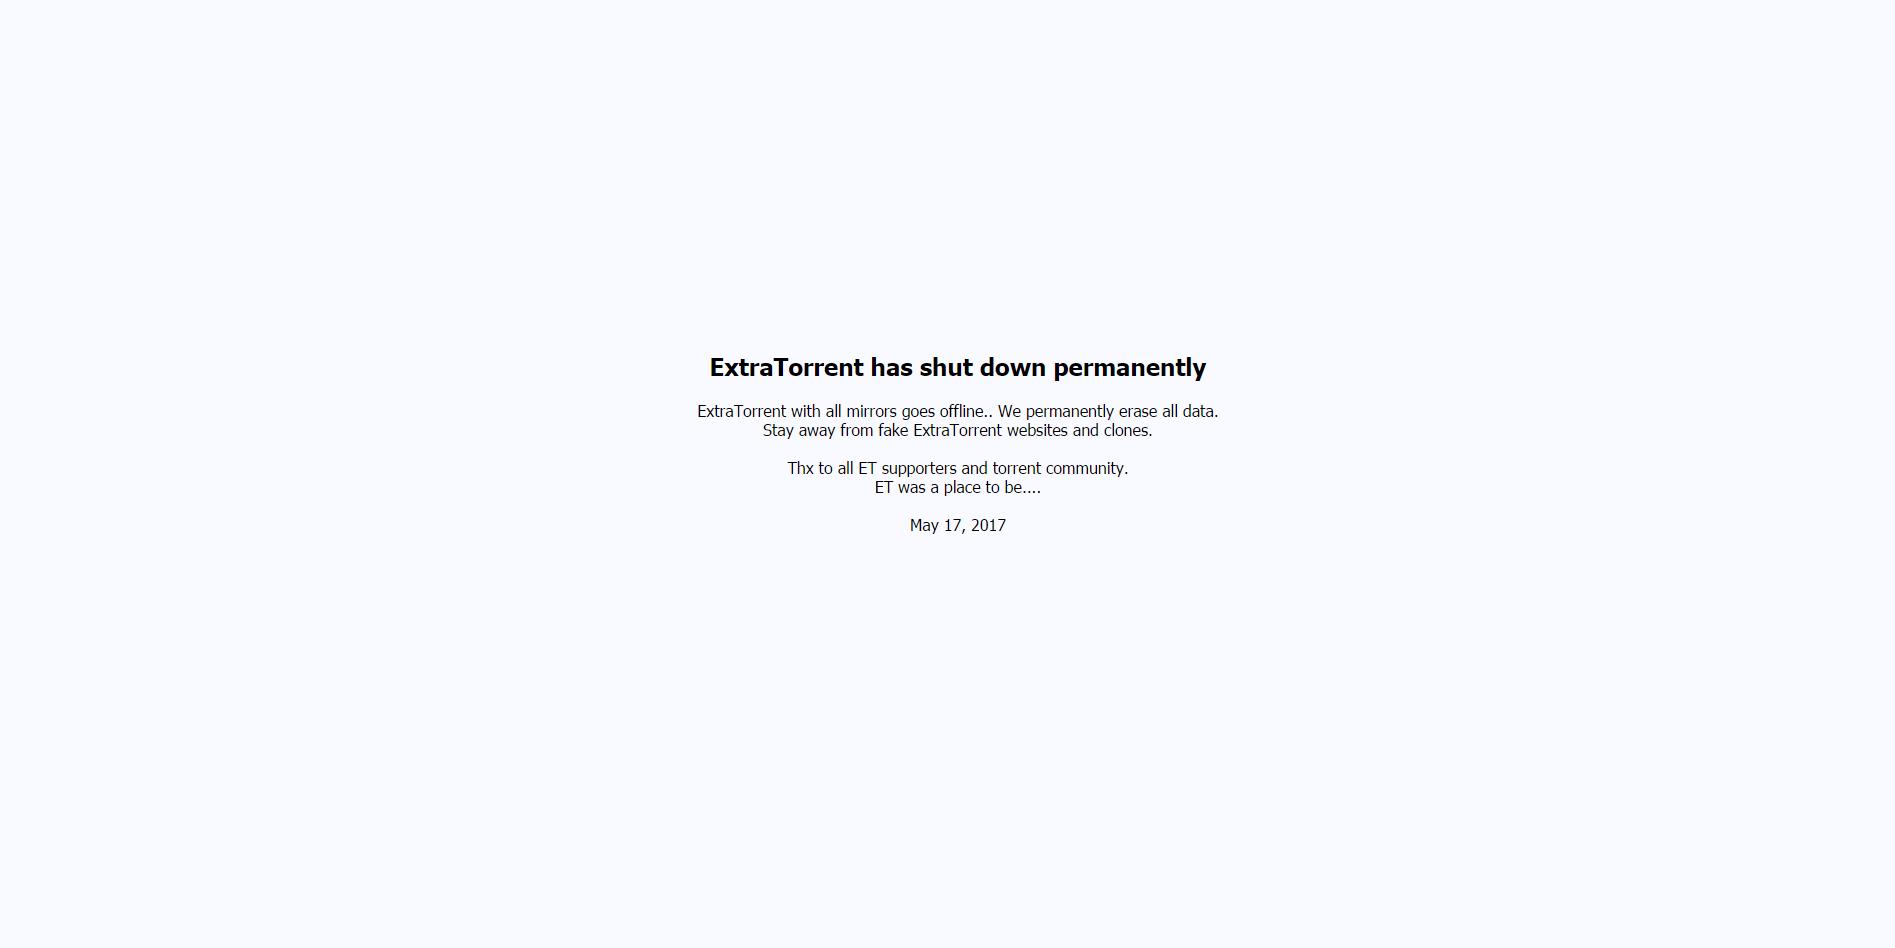 ExtraTorrent zamknięte